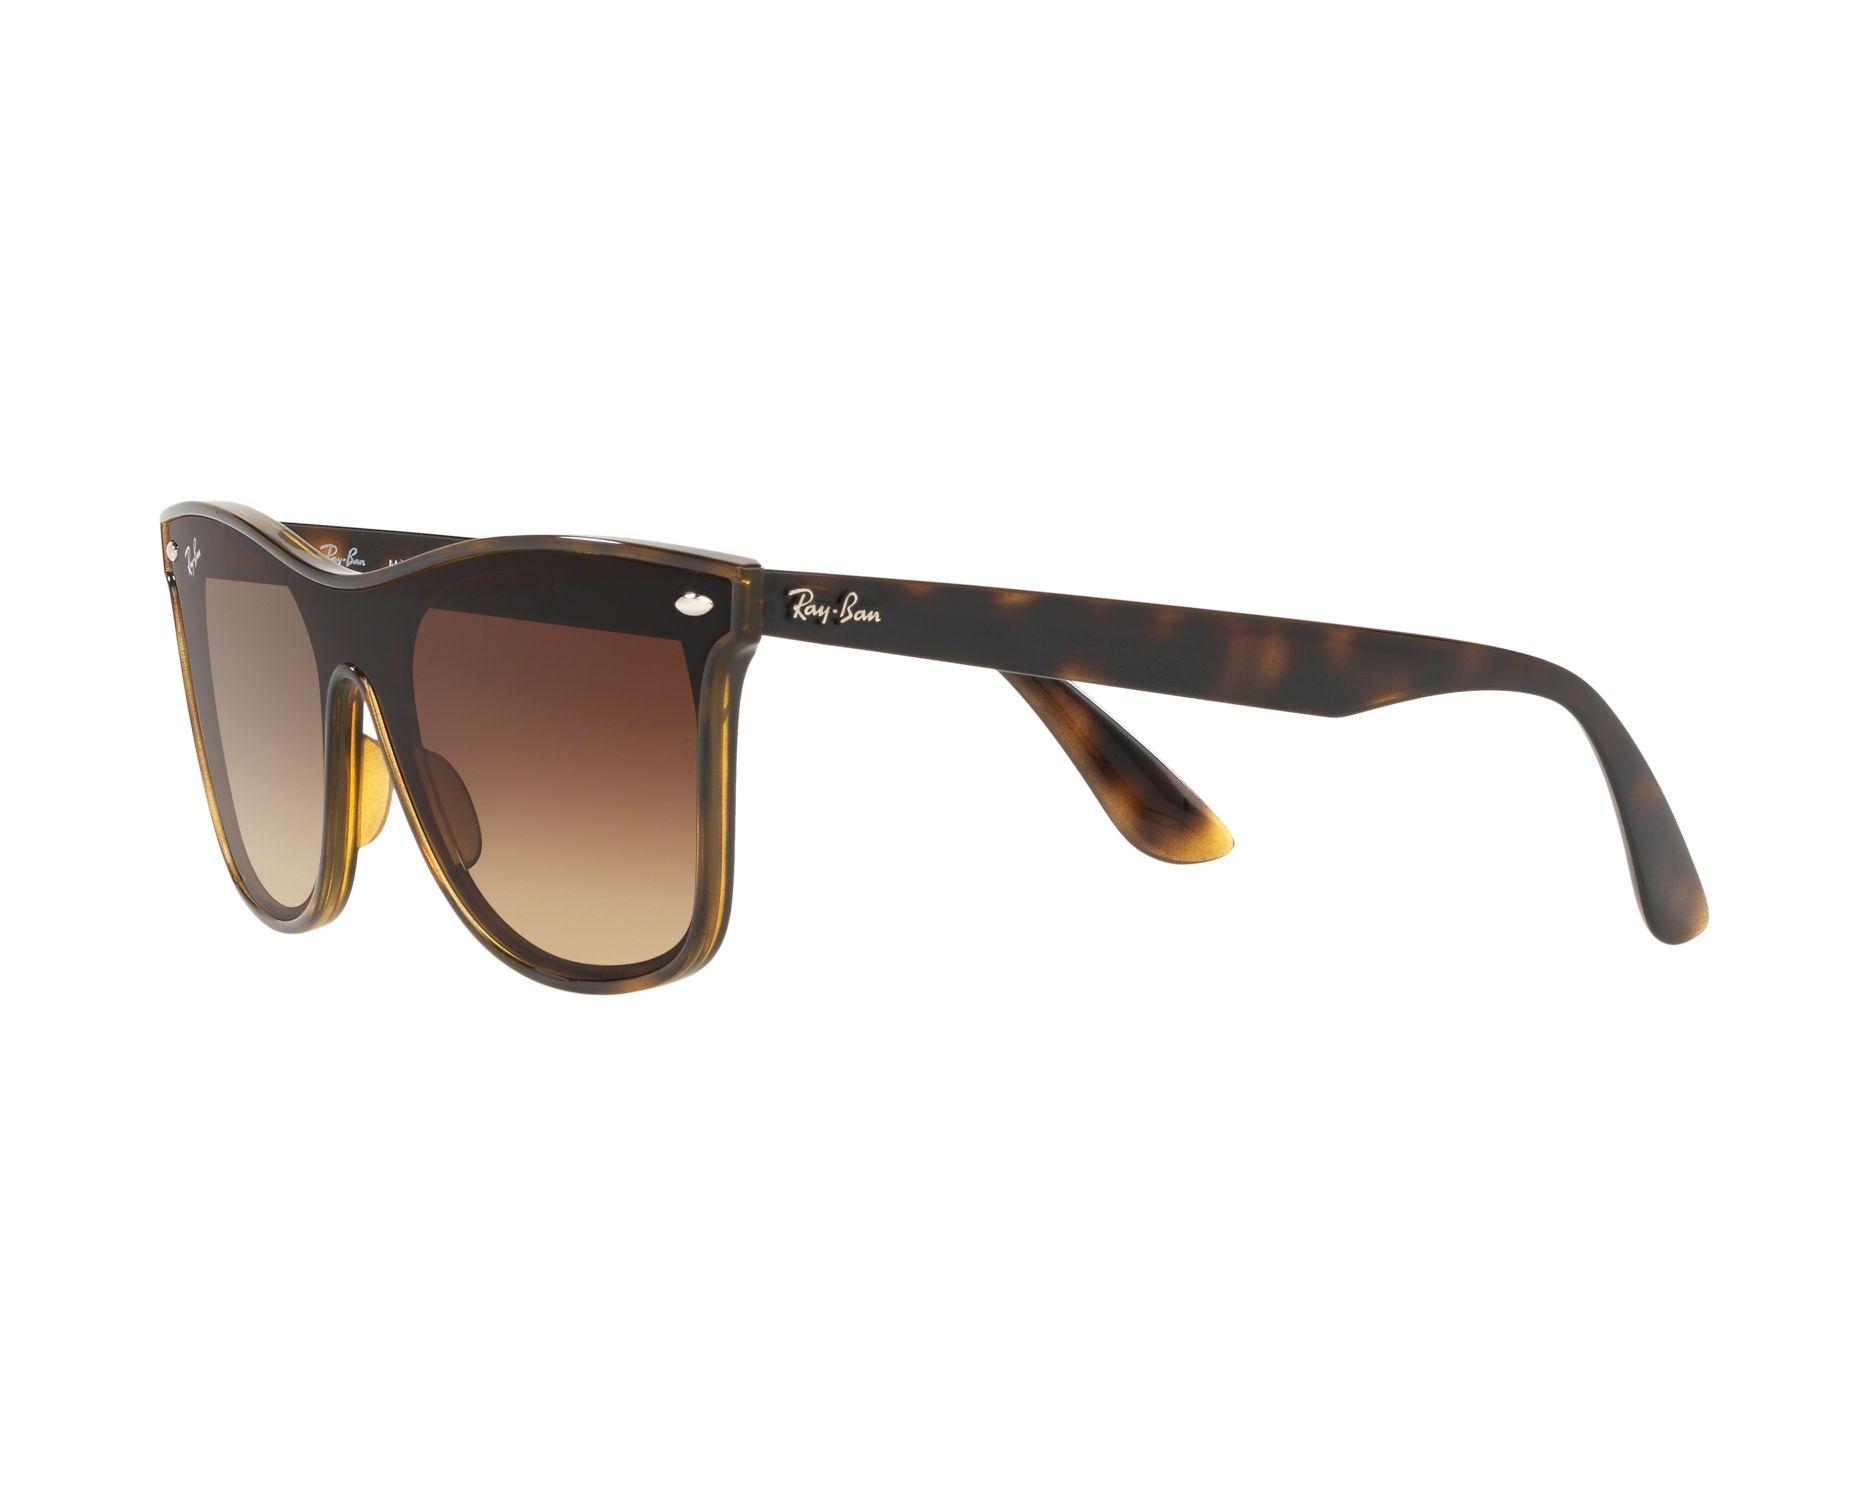 b92eddcc8a2098 Sunglasses Ray-Ban RB-4440-N 710/13 55-18 Havana